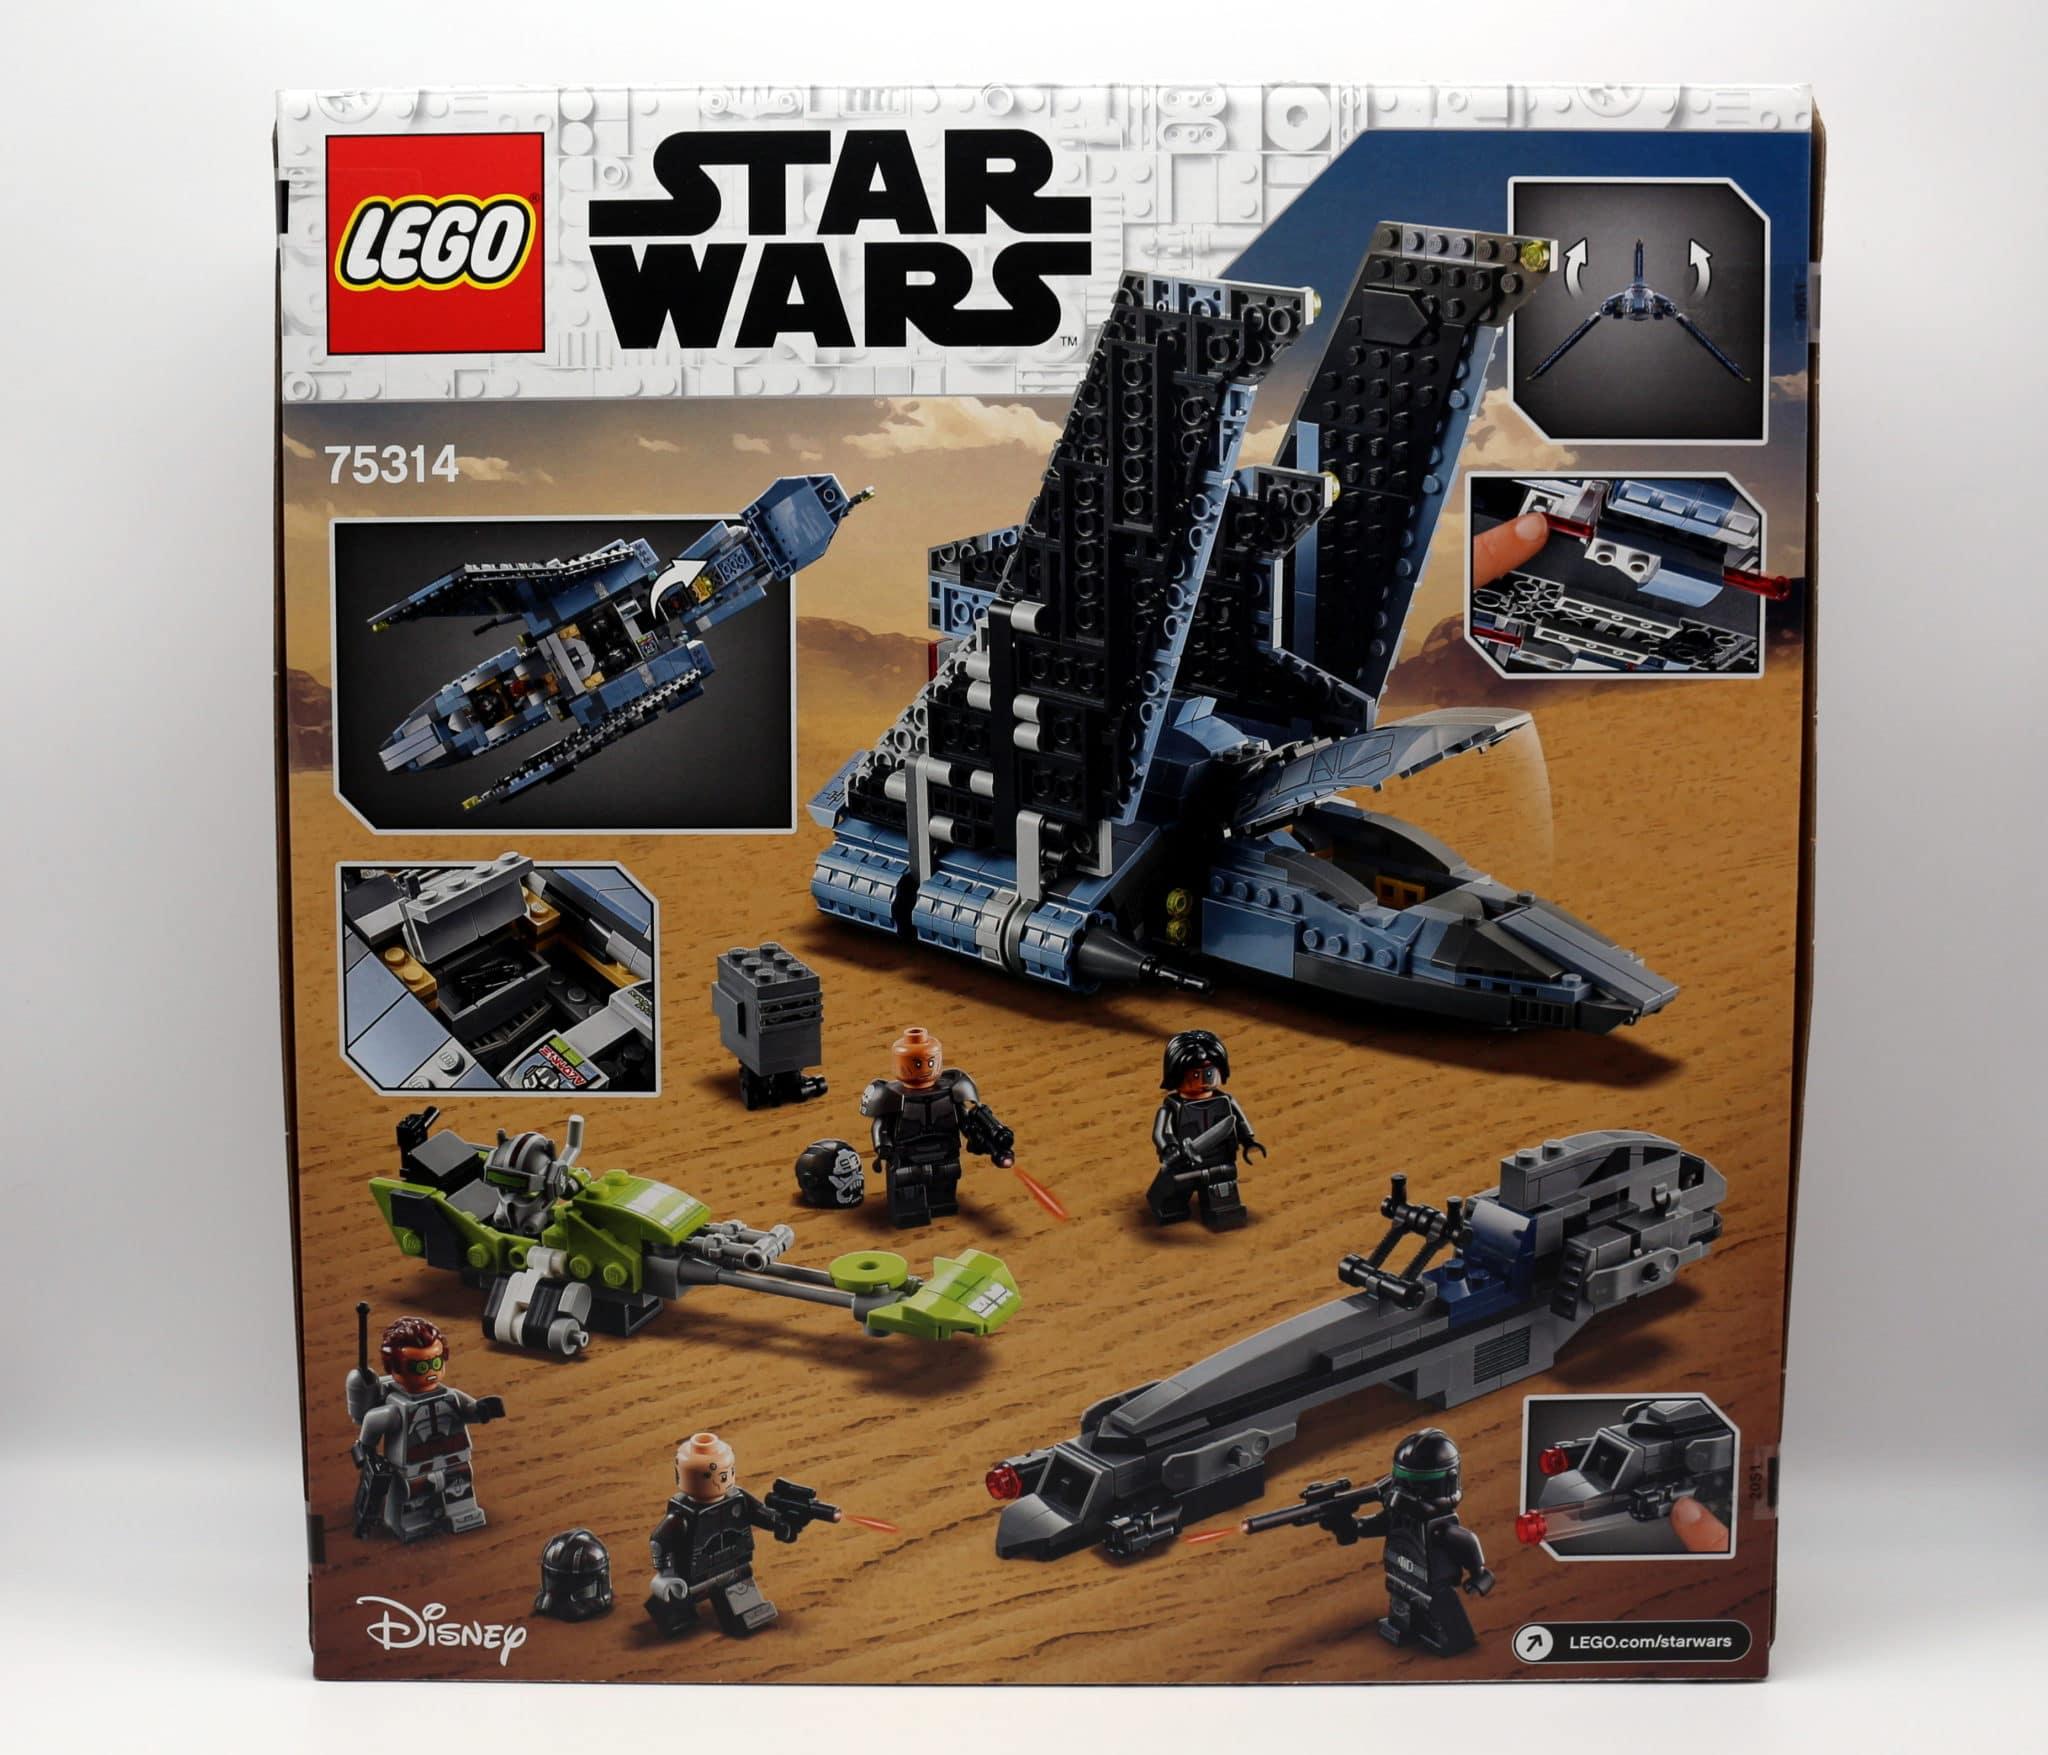 LEGO Star Wars 75314 The Bad Batch Attack Shuttle Box Back